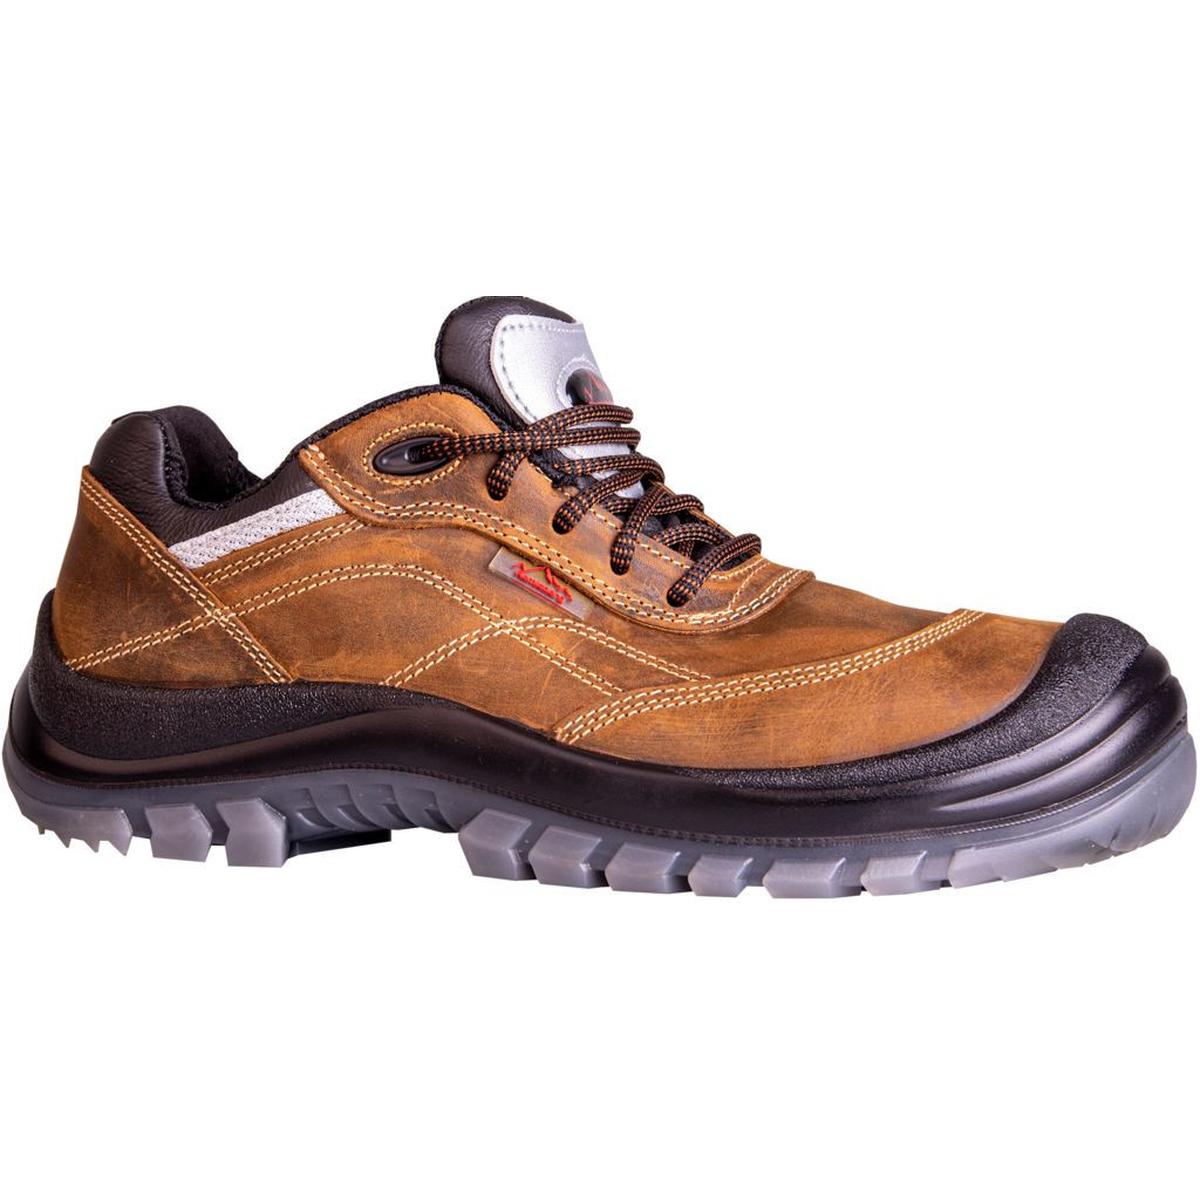 Halbschuhe Damen Schuhe Sneakers NEU Moderne BW33220 Slipper Rot 36